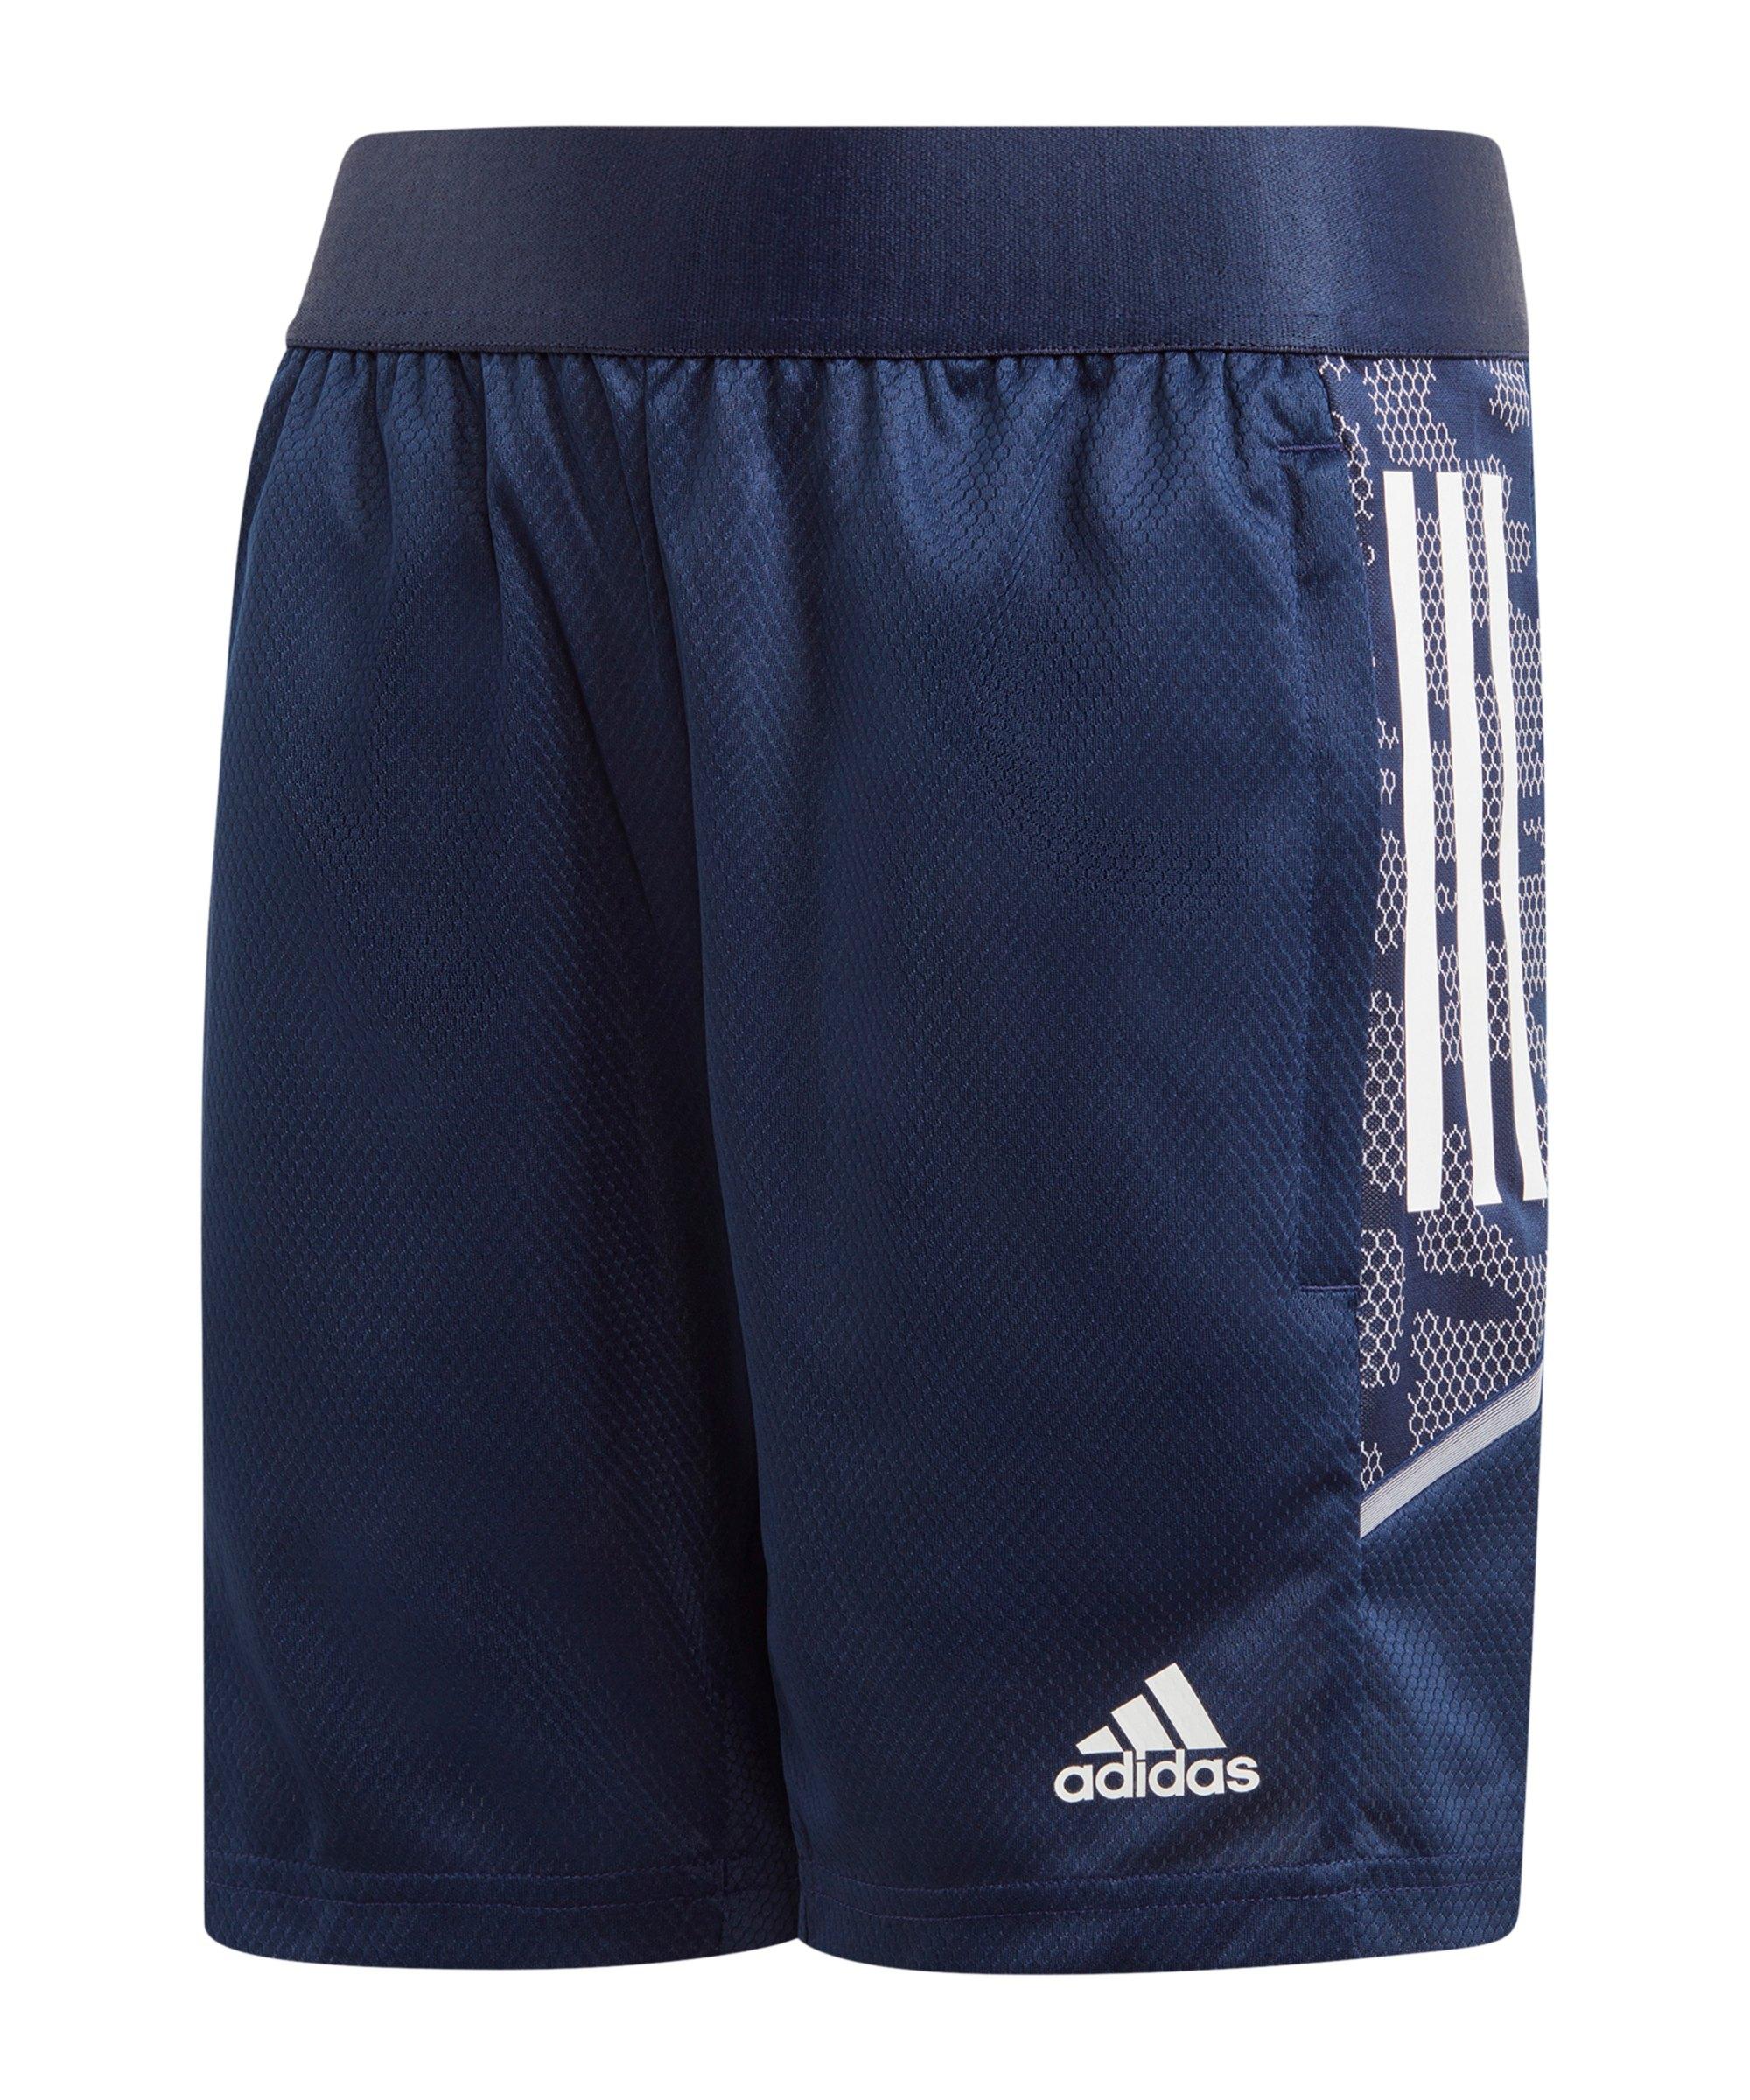 adidas Condivo 21 Short Kids Dunkelblau - blau